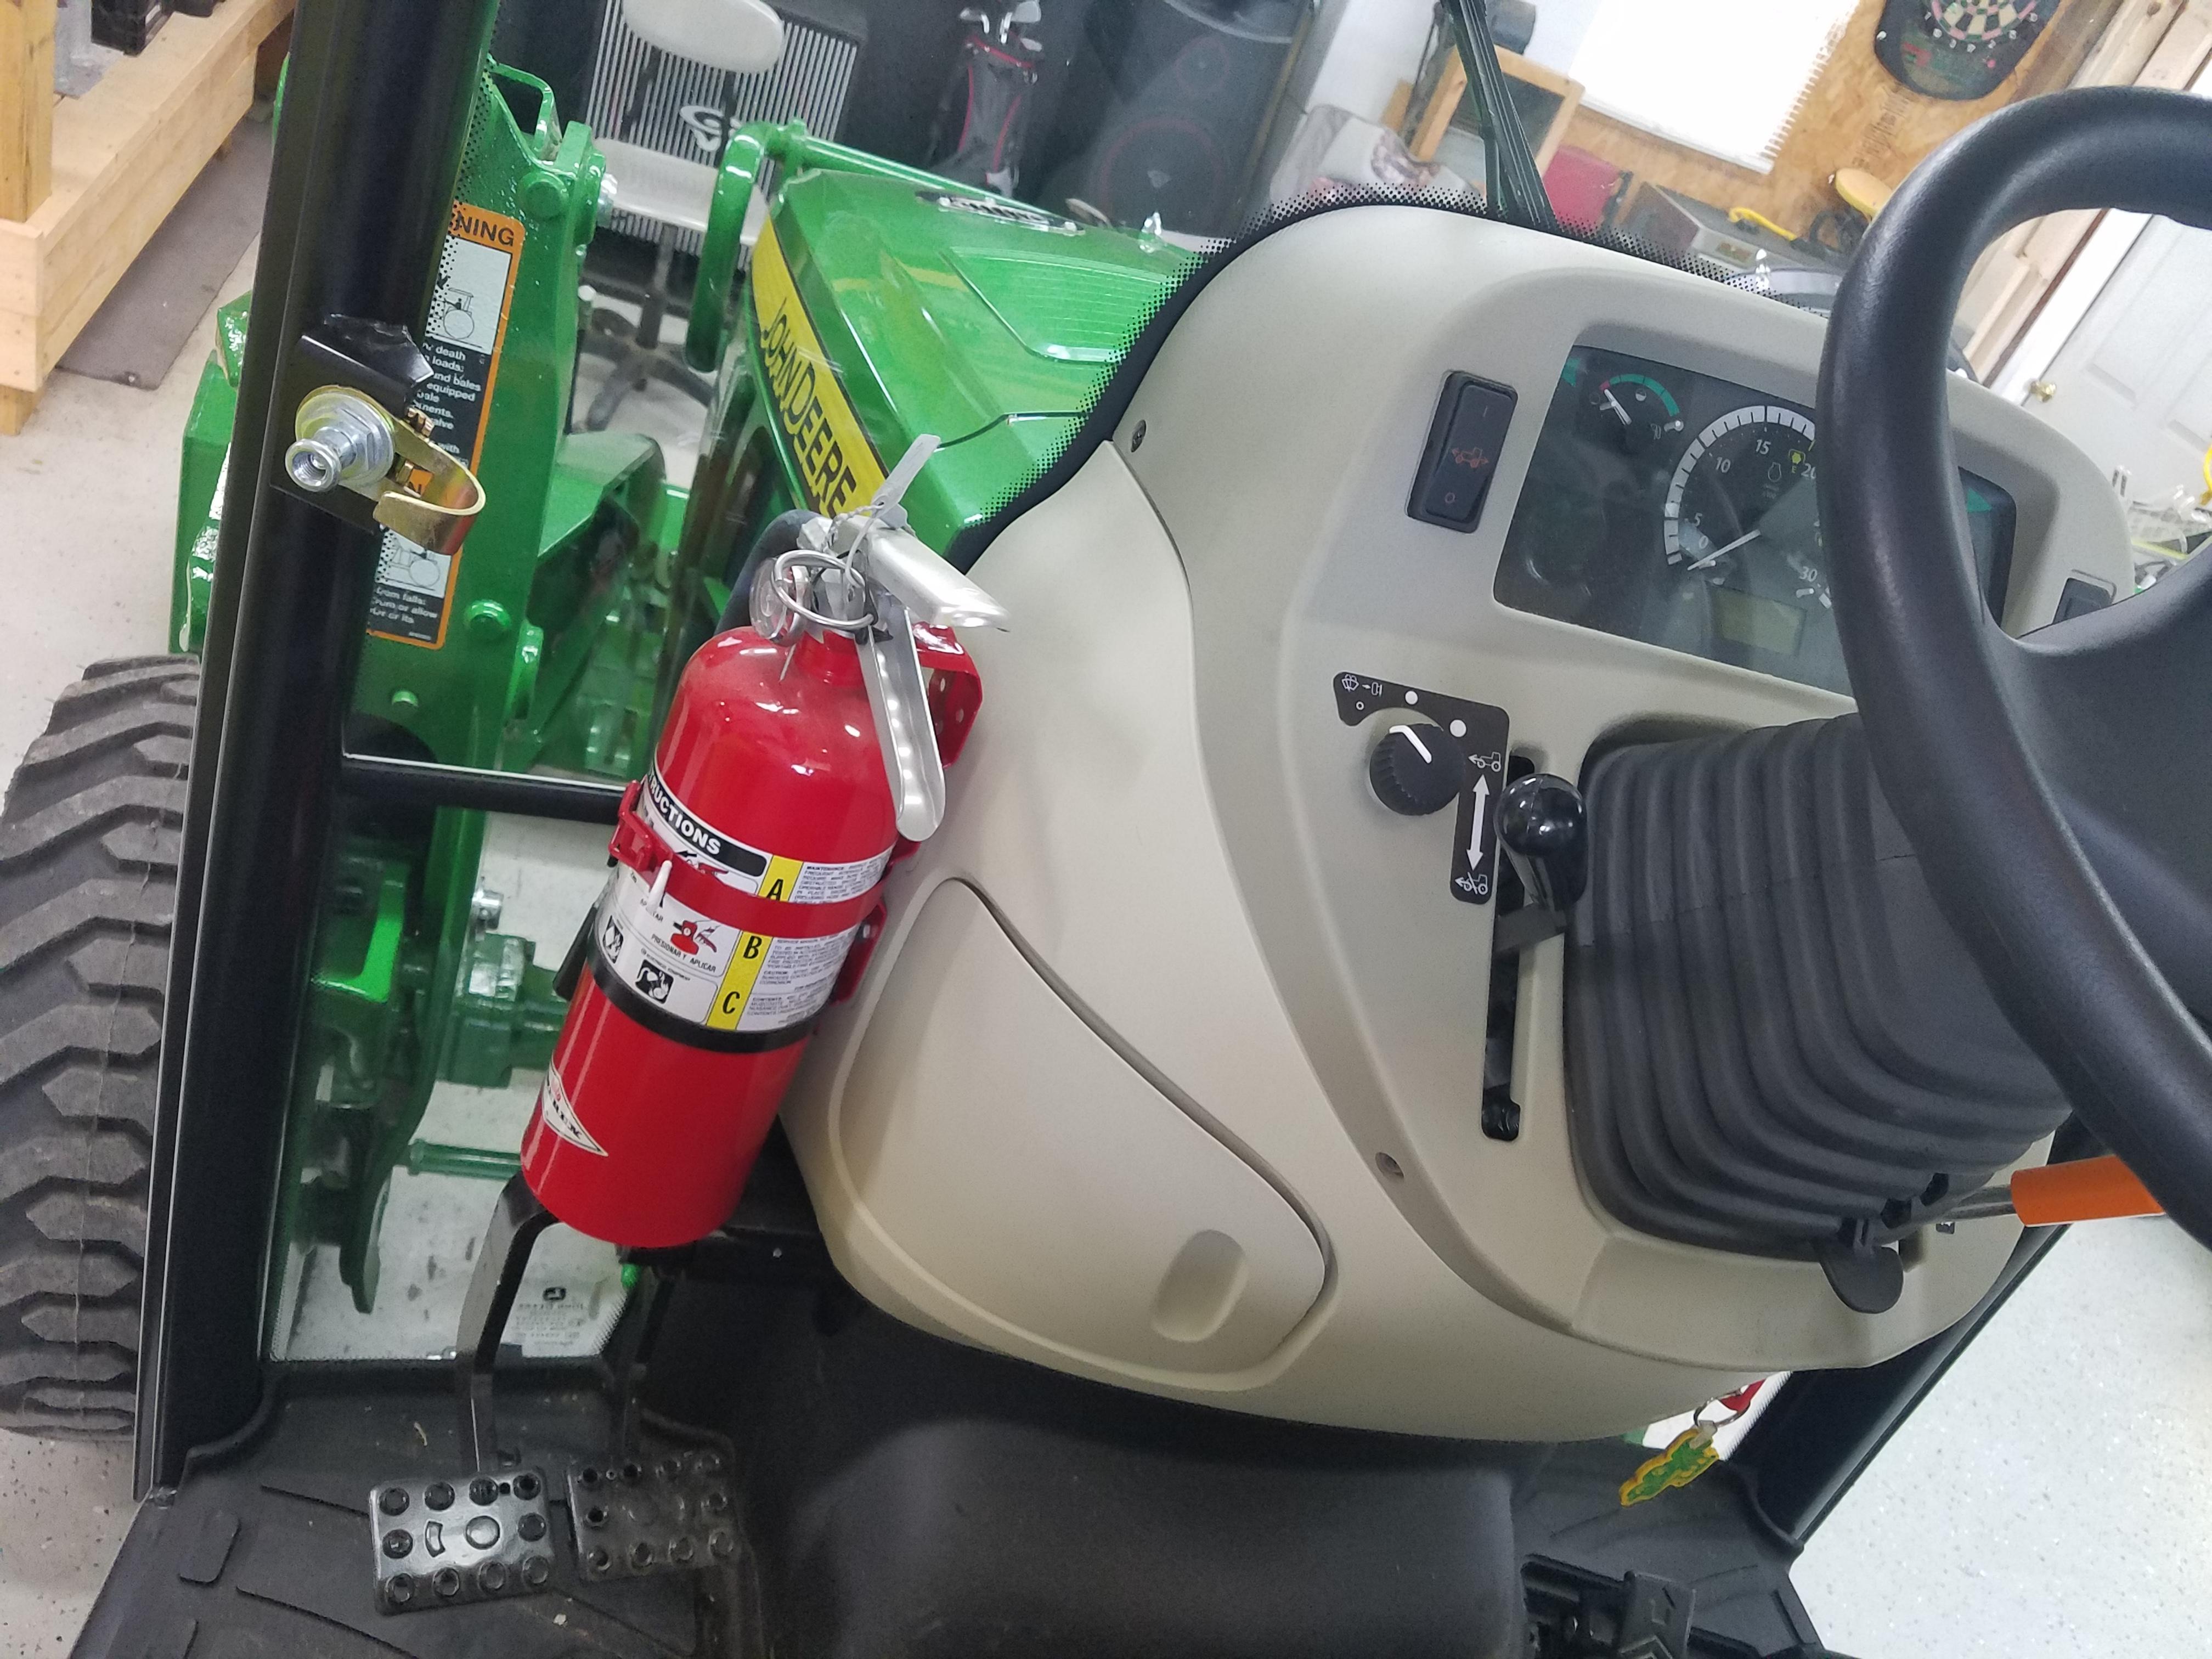 John Deere Fire Extinguishers : Fire extinguisher in r cab